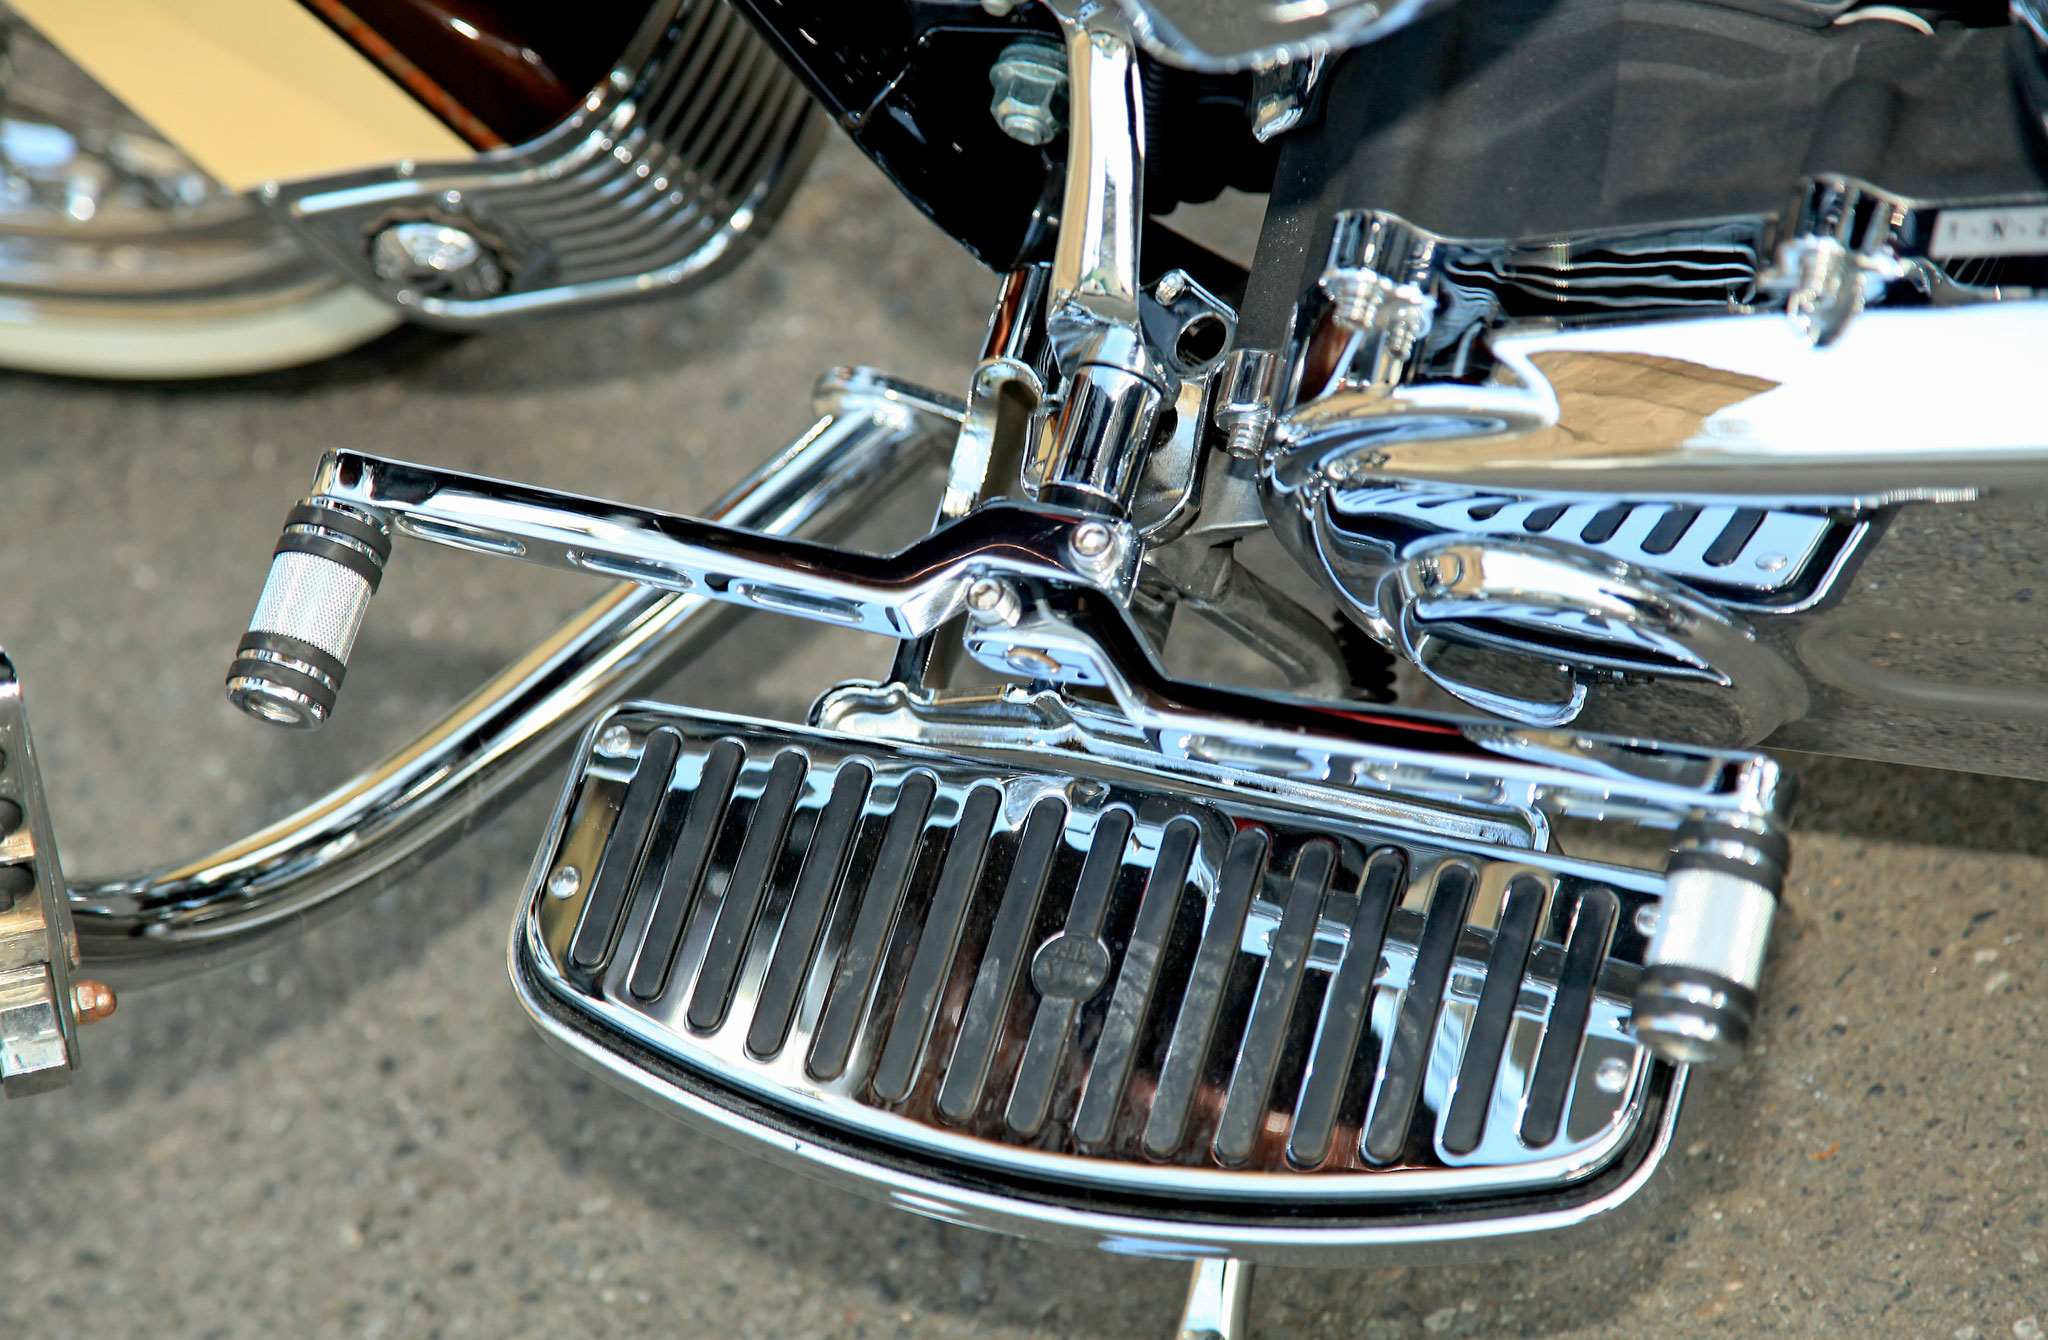 2005 Harley Davidson Softail Hoggin Up All Lanes